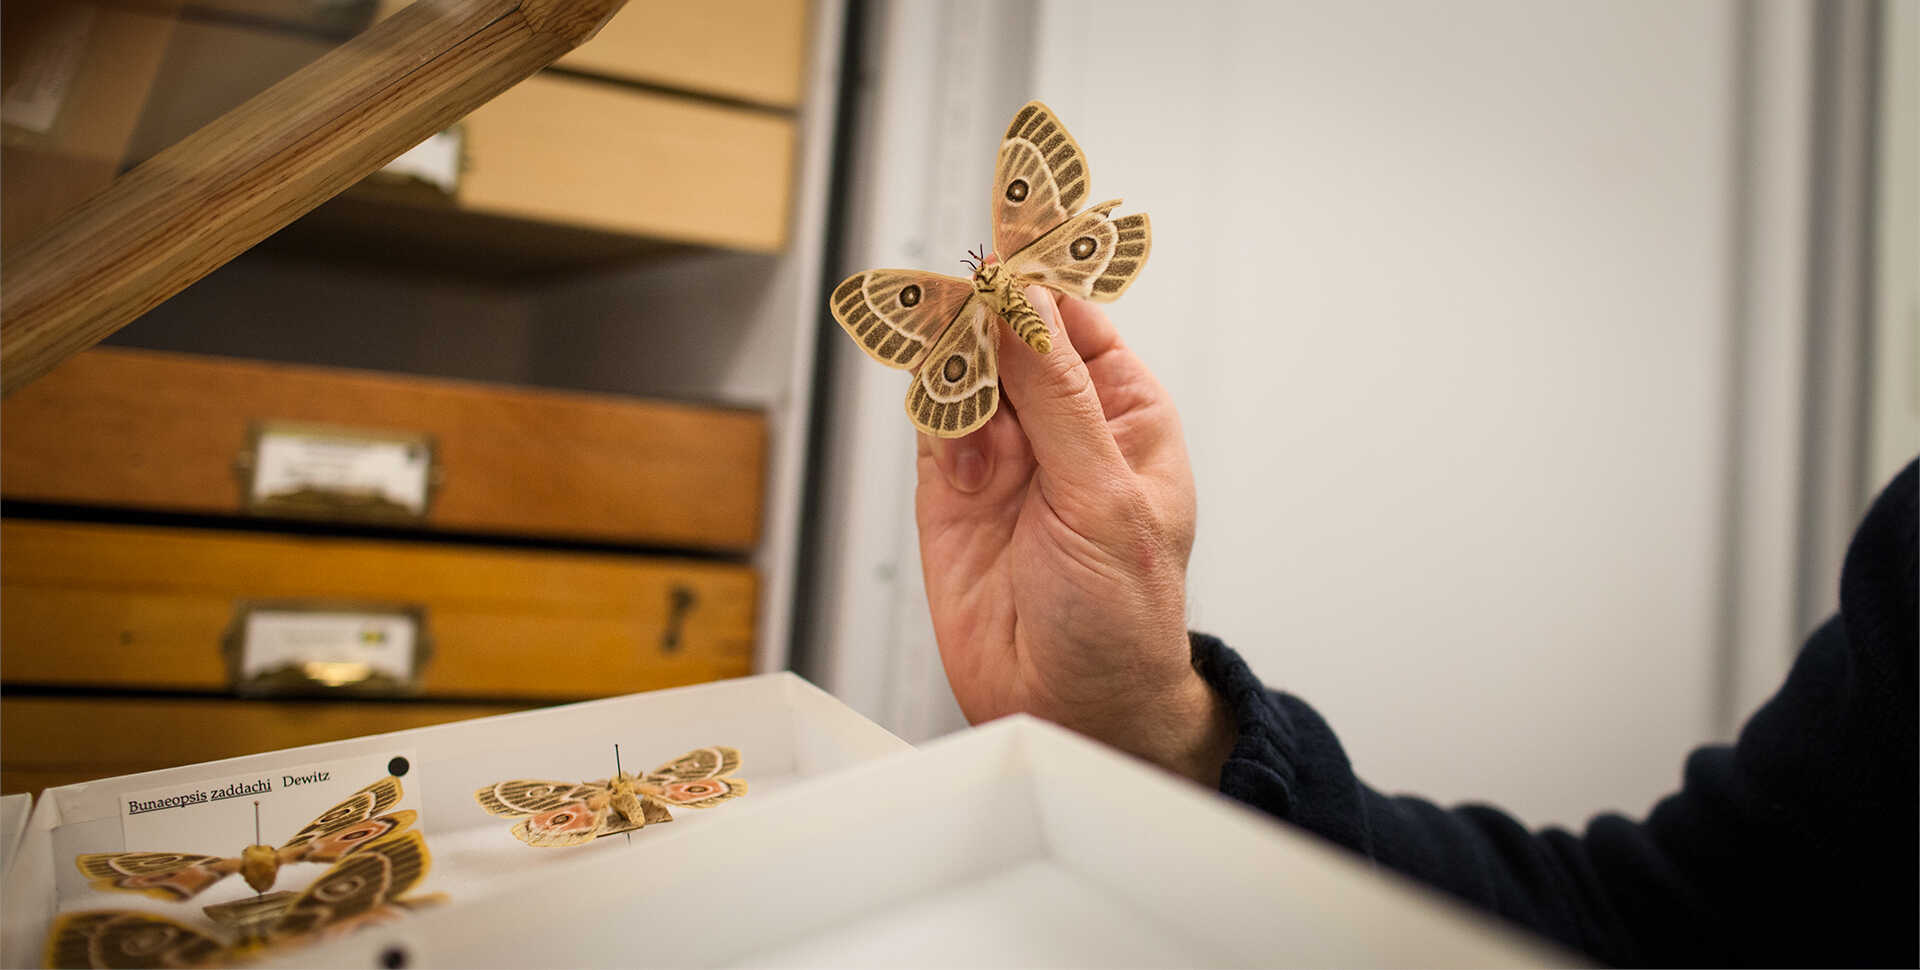 A Bunaeopsis zaddachi (moth) specimen